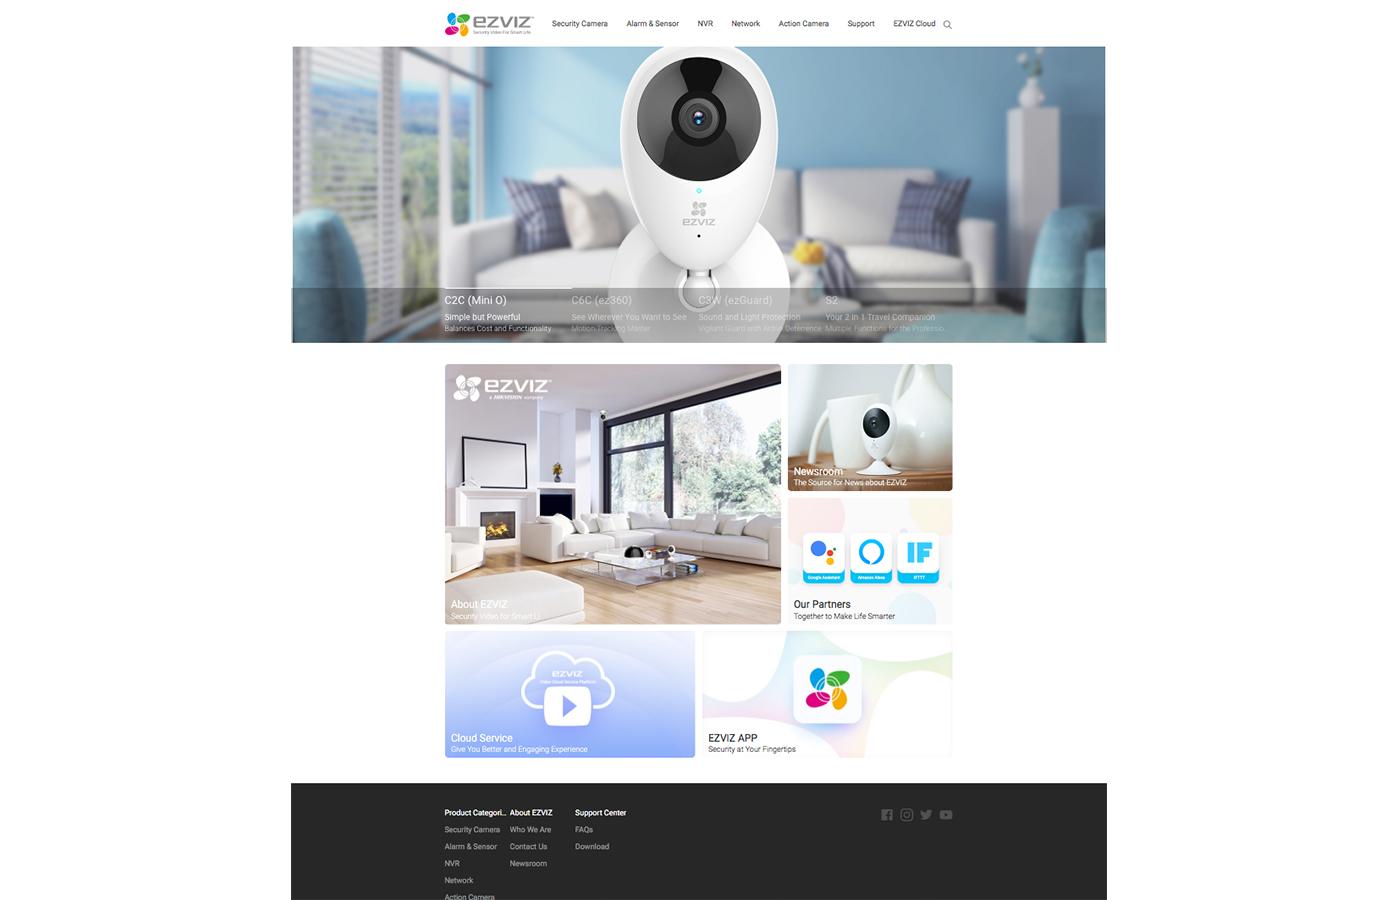 EZVIZ Inc   A Hikvision Company – xeverfree